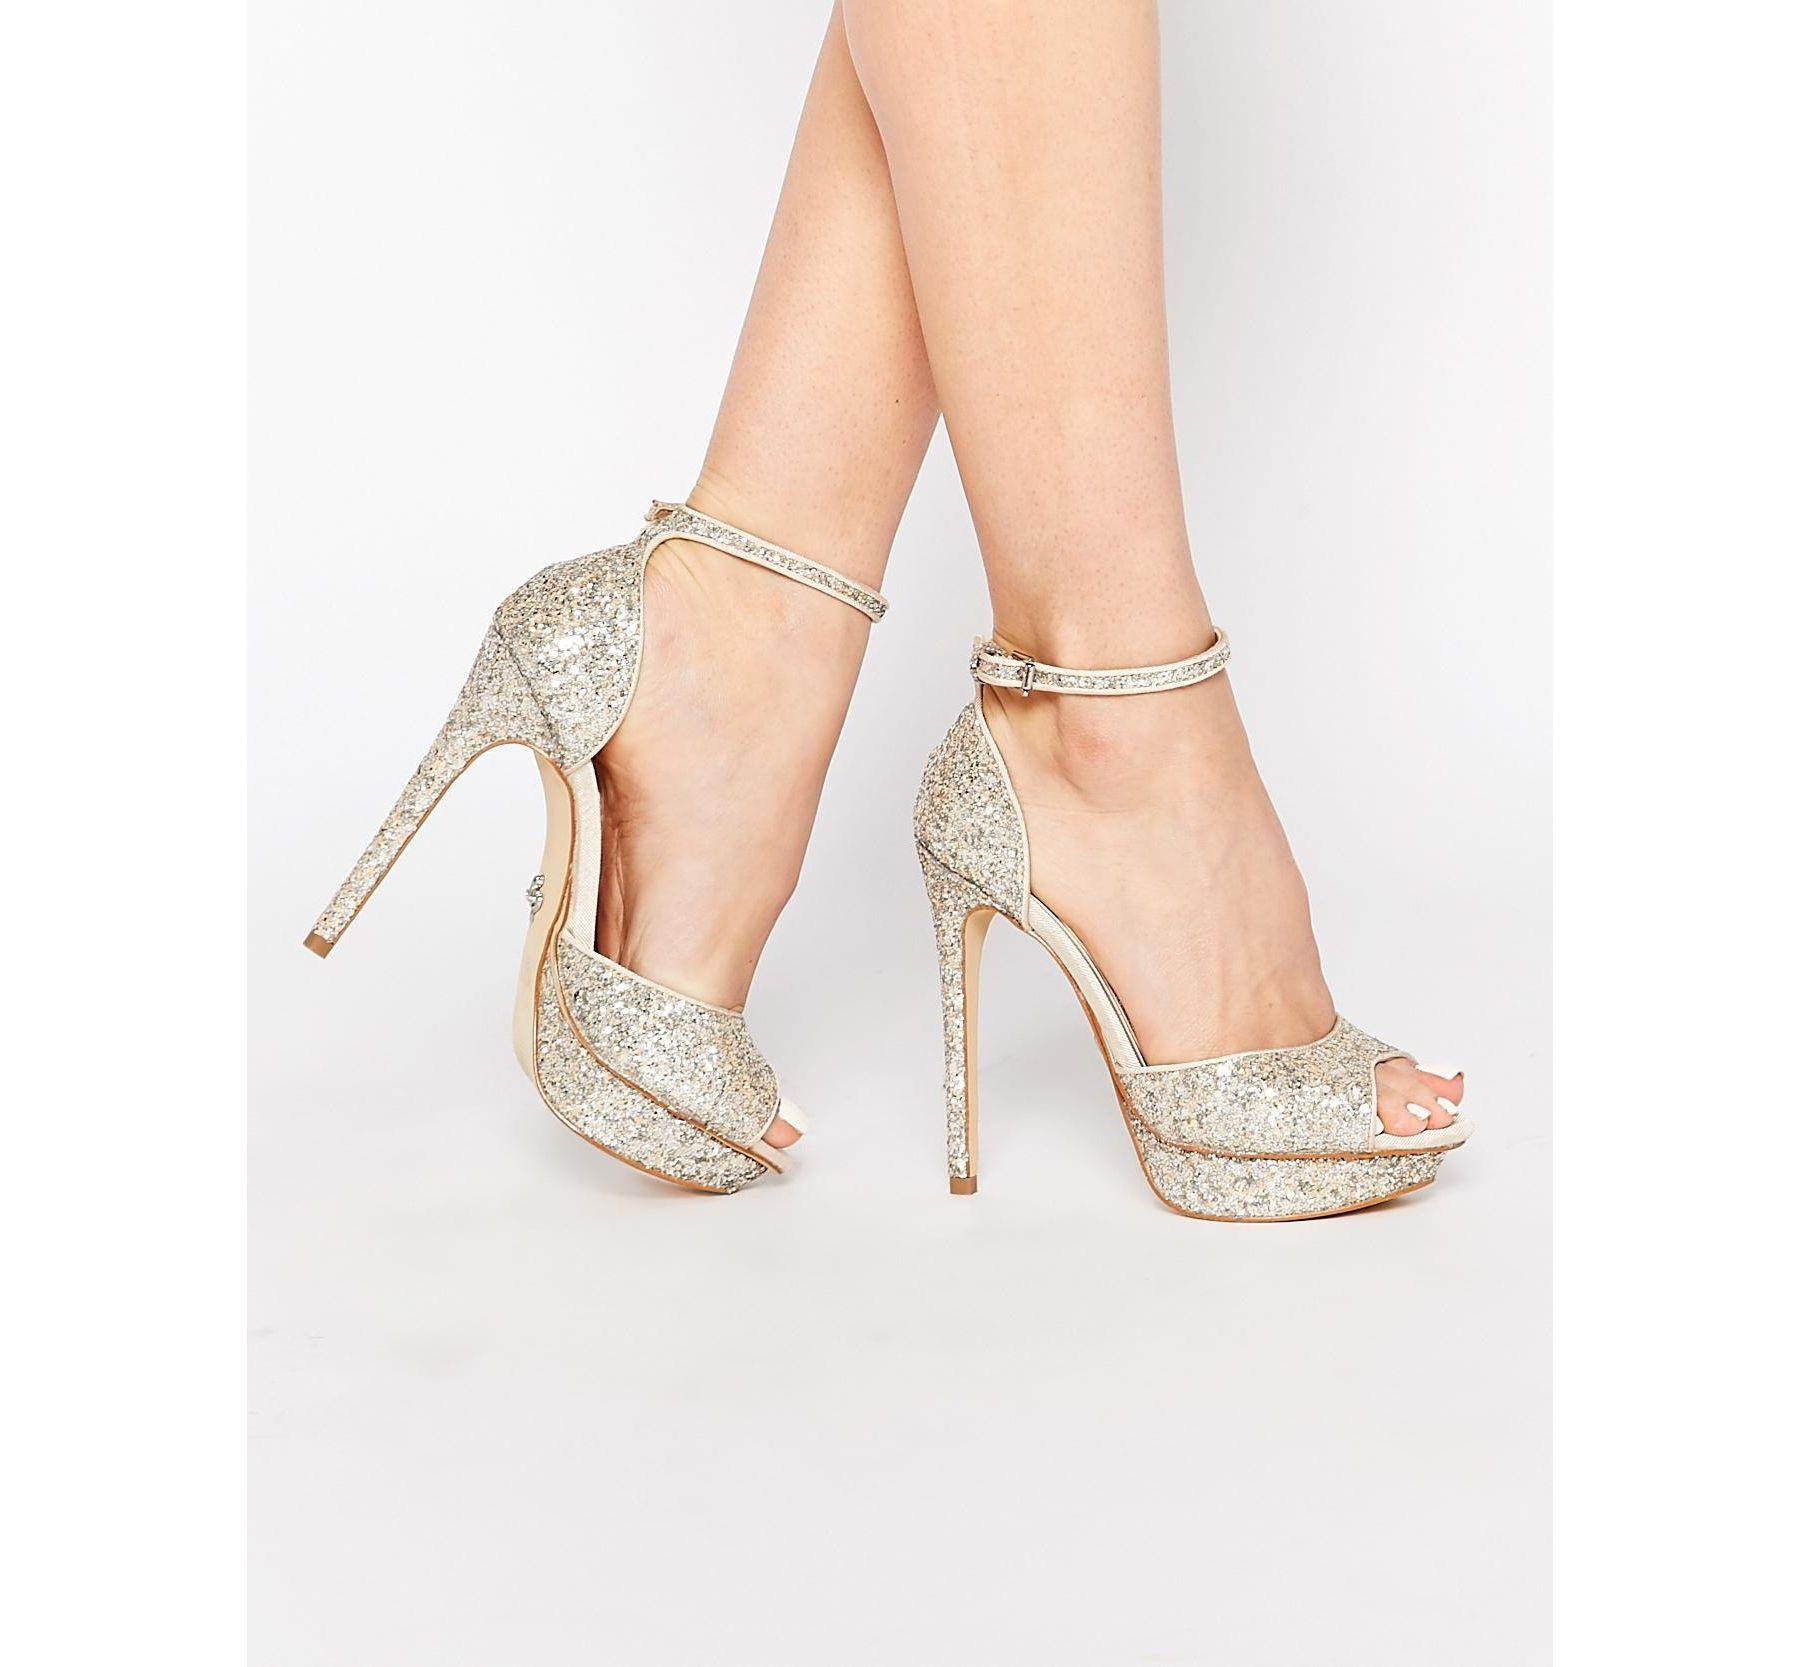 c6cbe3964e5cf4 Lyst - Lipsy Molly Silver Glitter Platform Heeled Sandals in Metallic